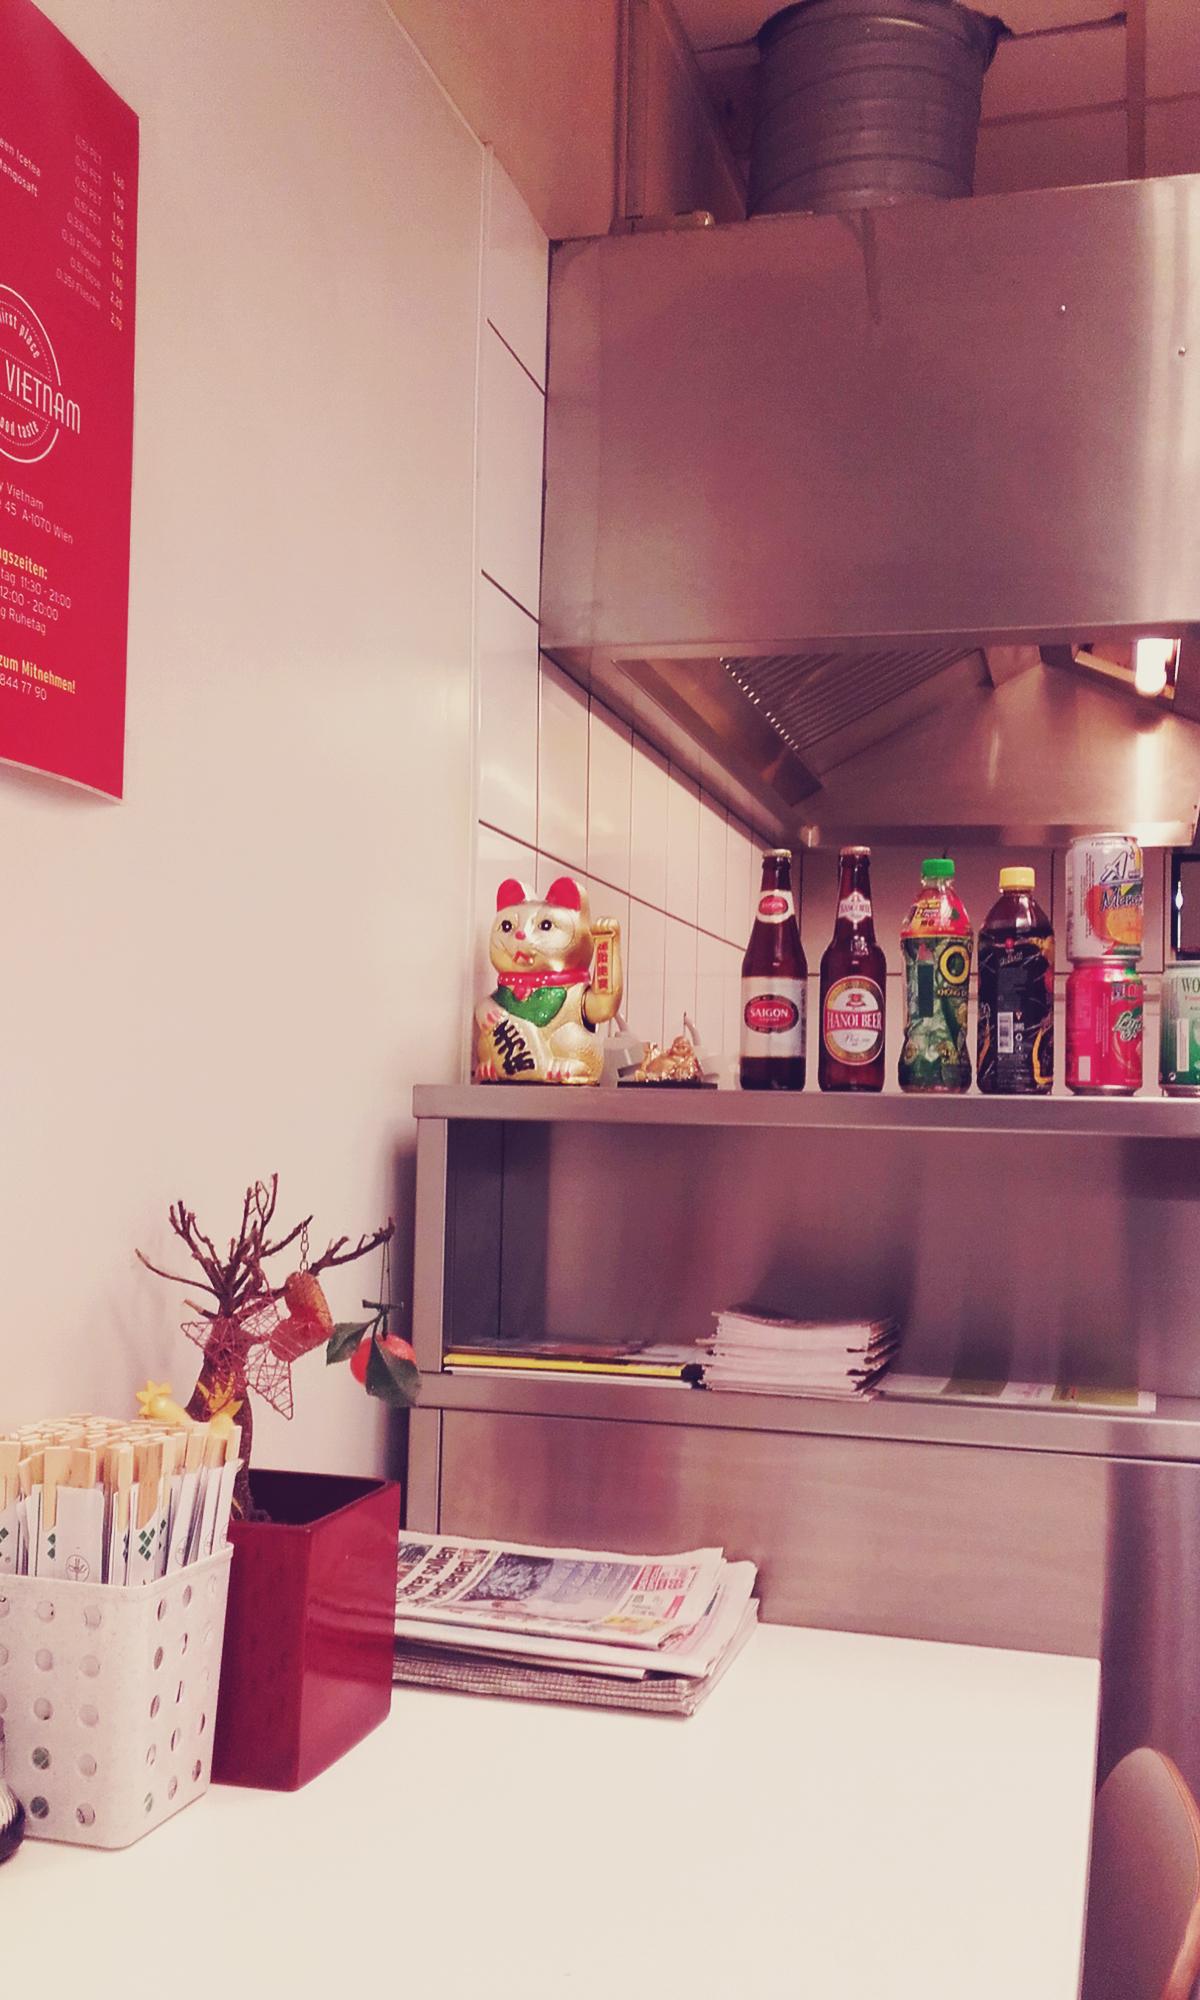 vietnamese, take-out, travel, eat, Vienna